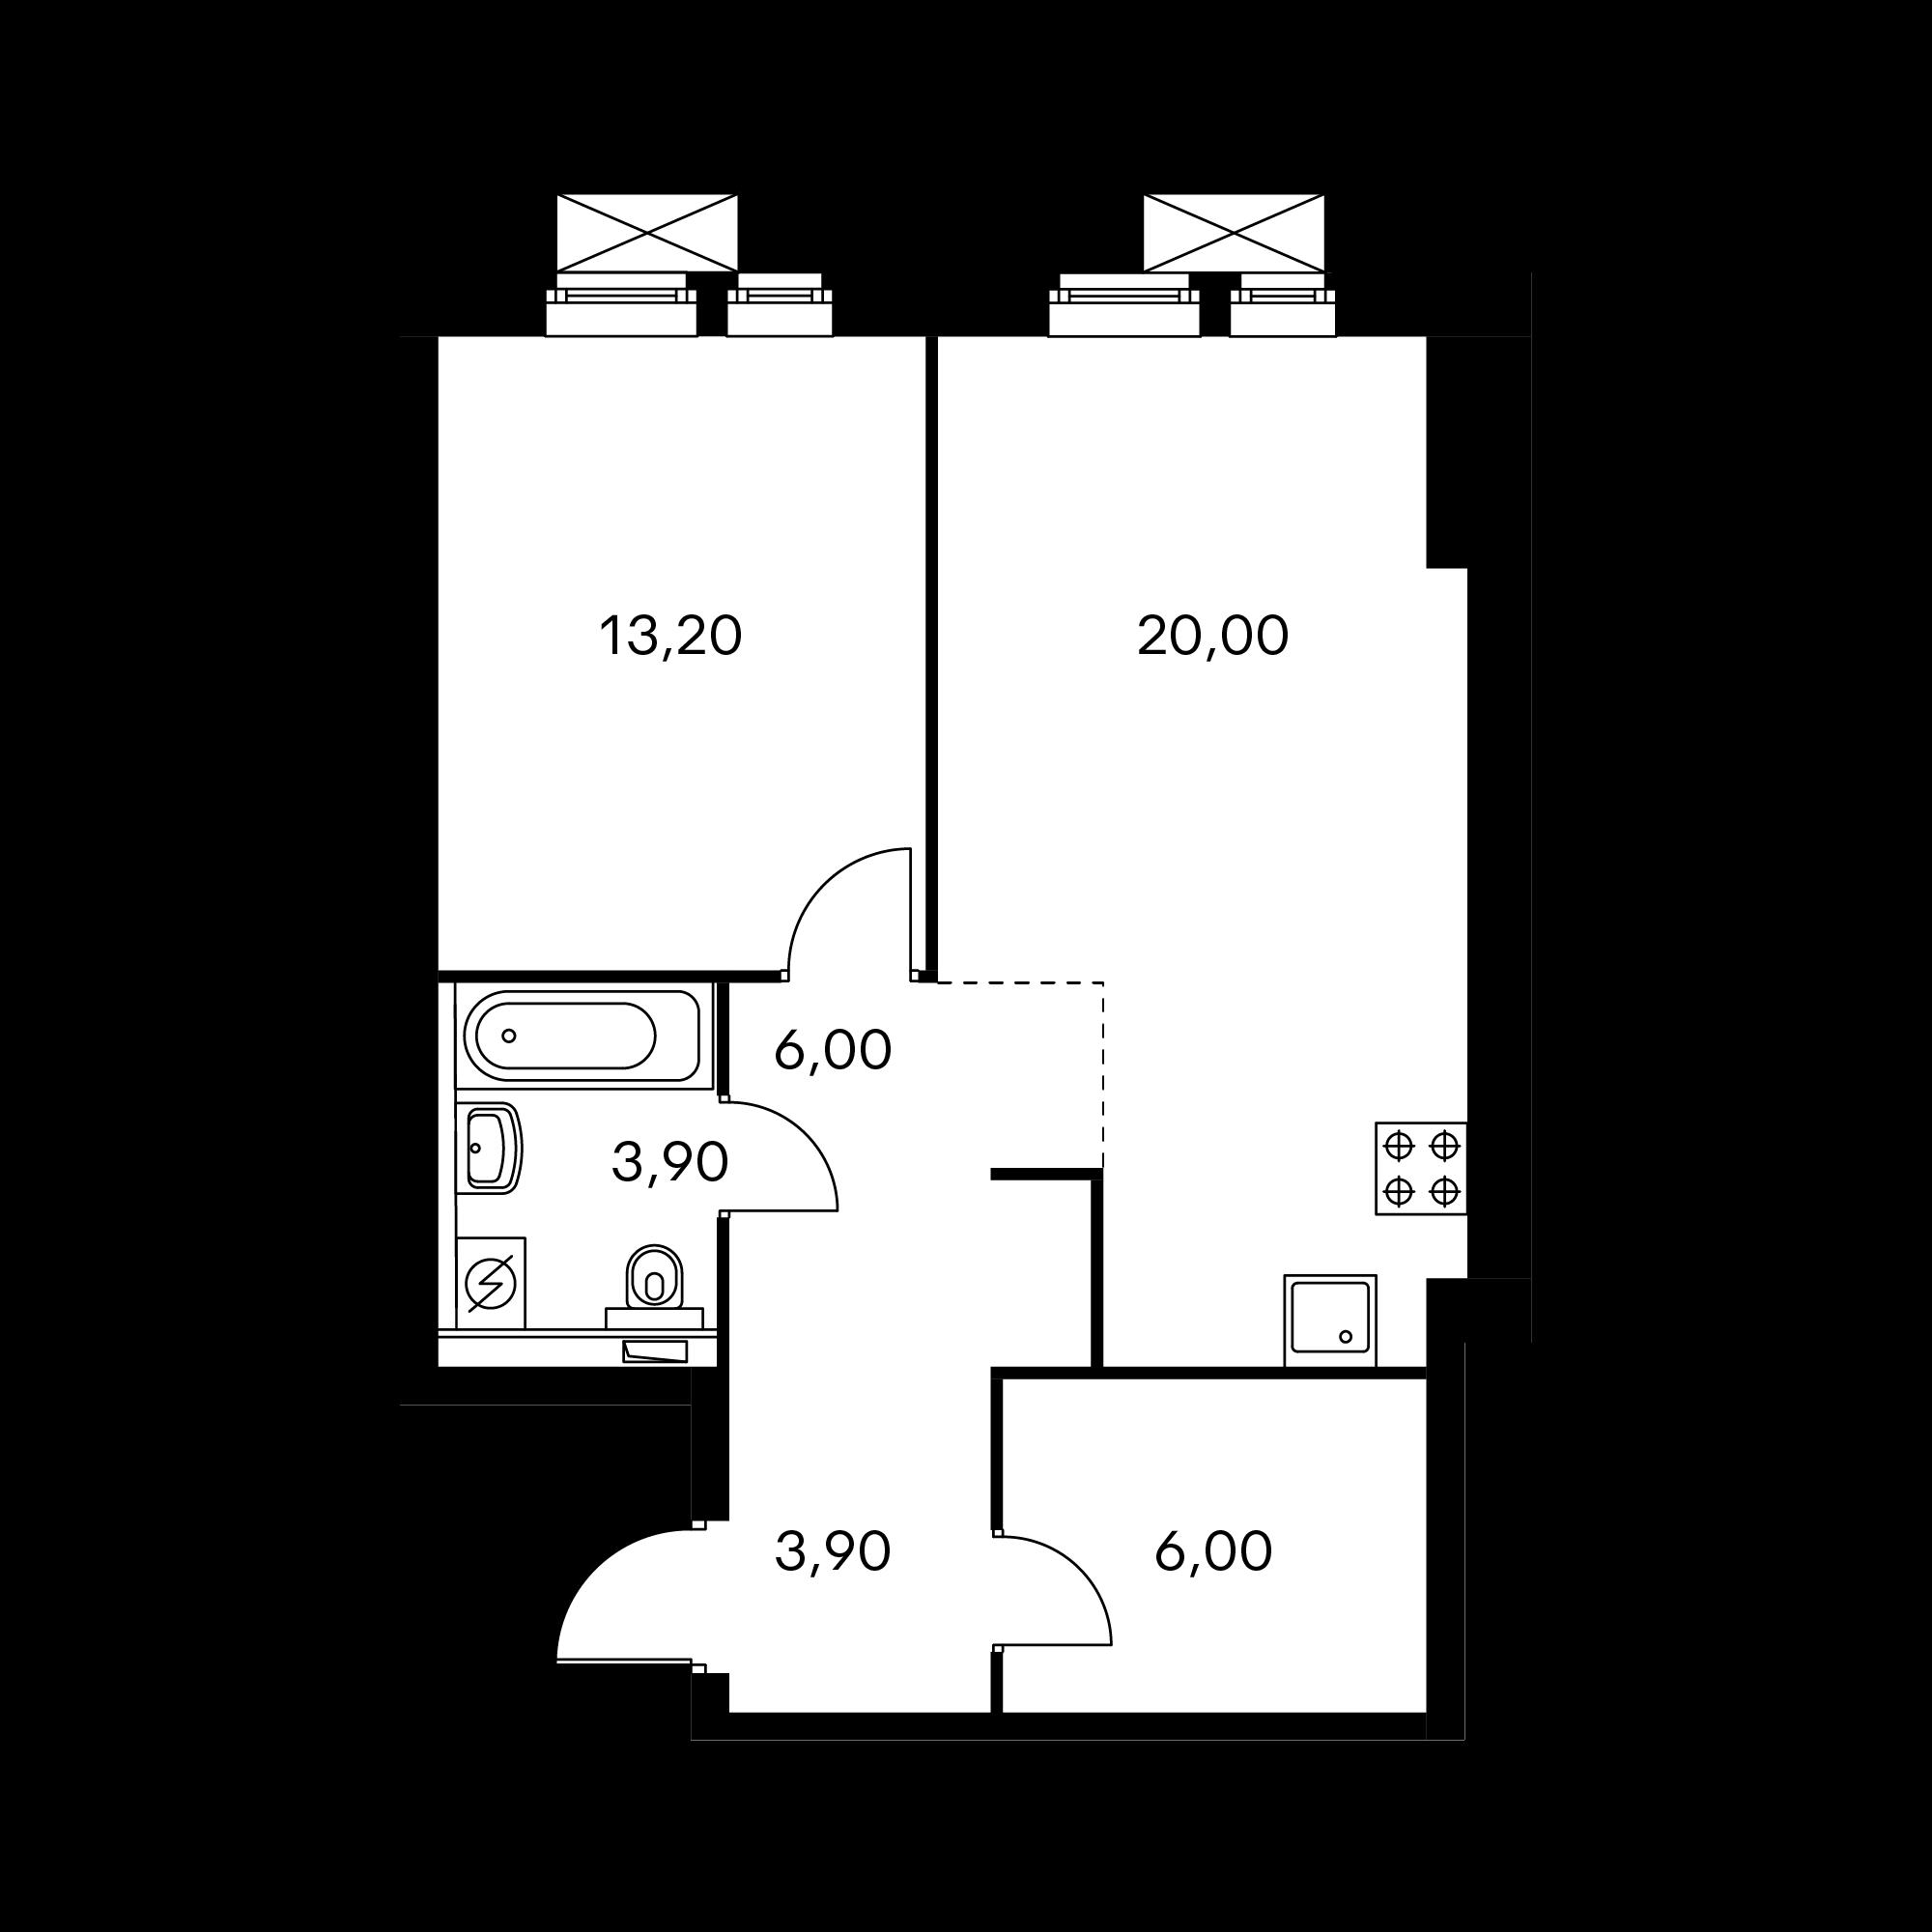 1EL2_6.9